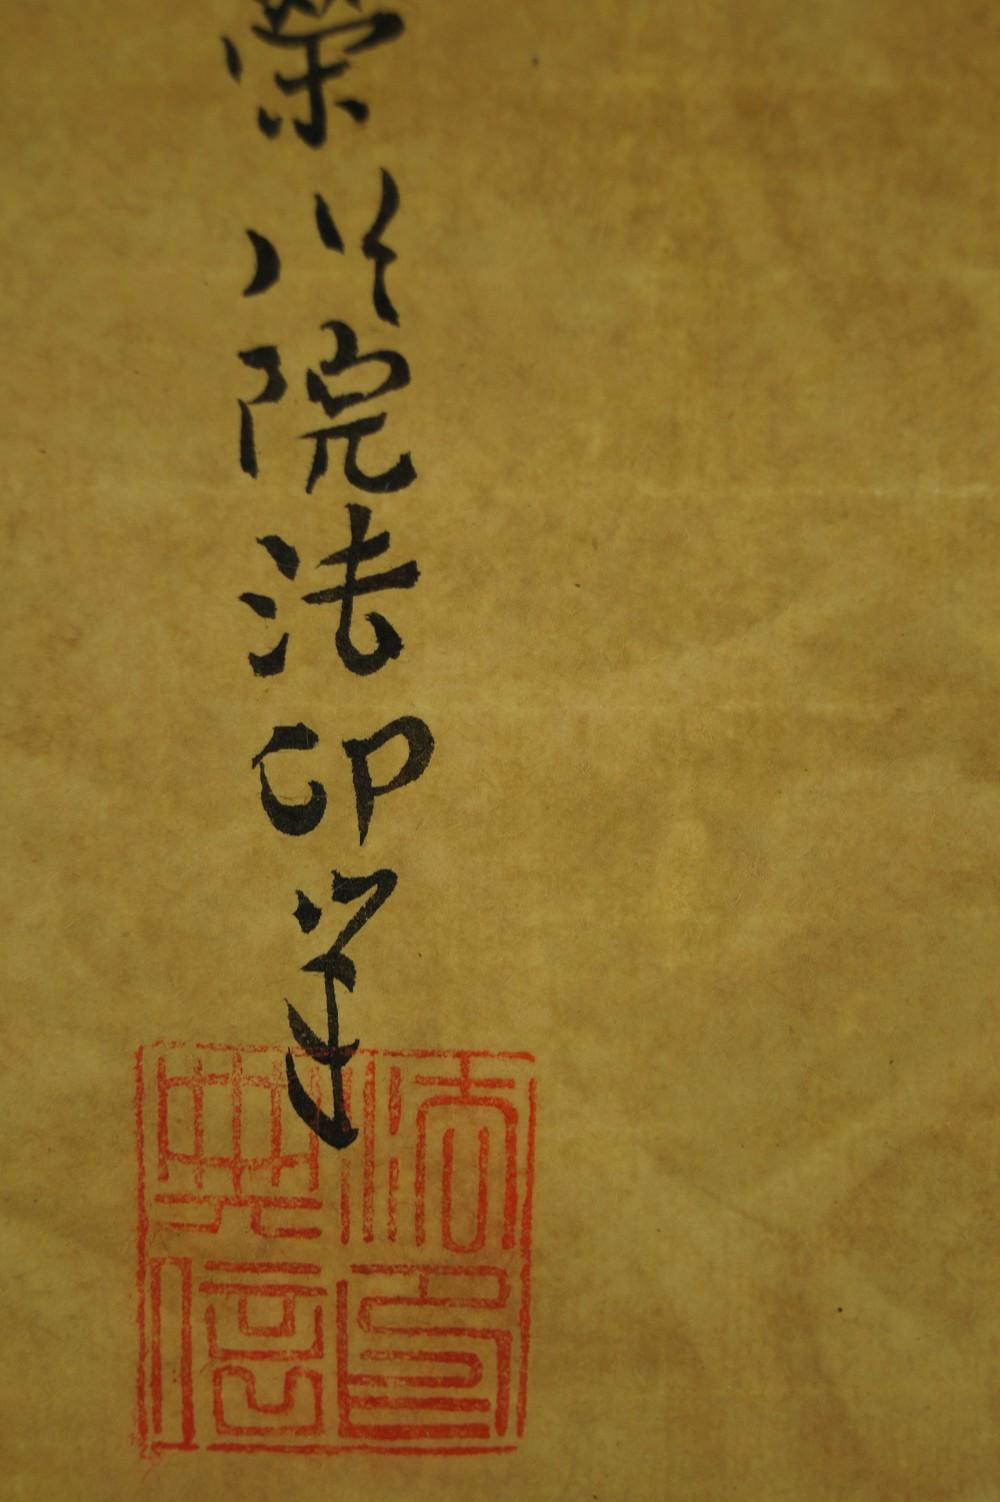 Mönch - Japanisches Rollbild (Kakejiku, Kakemono)